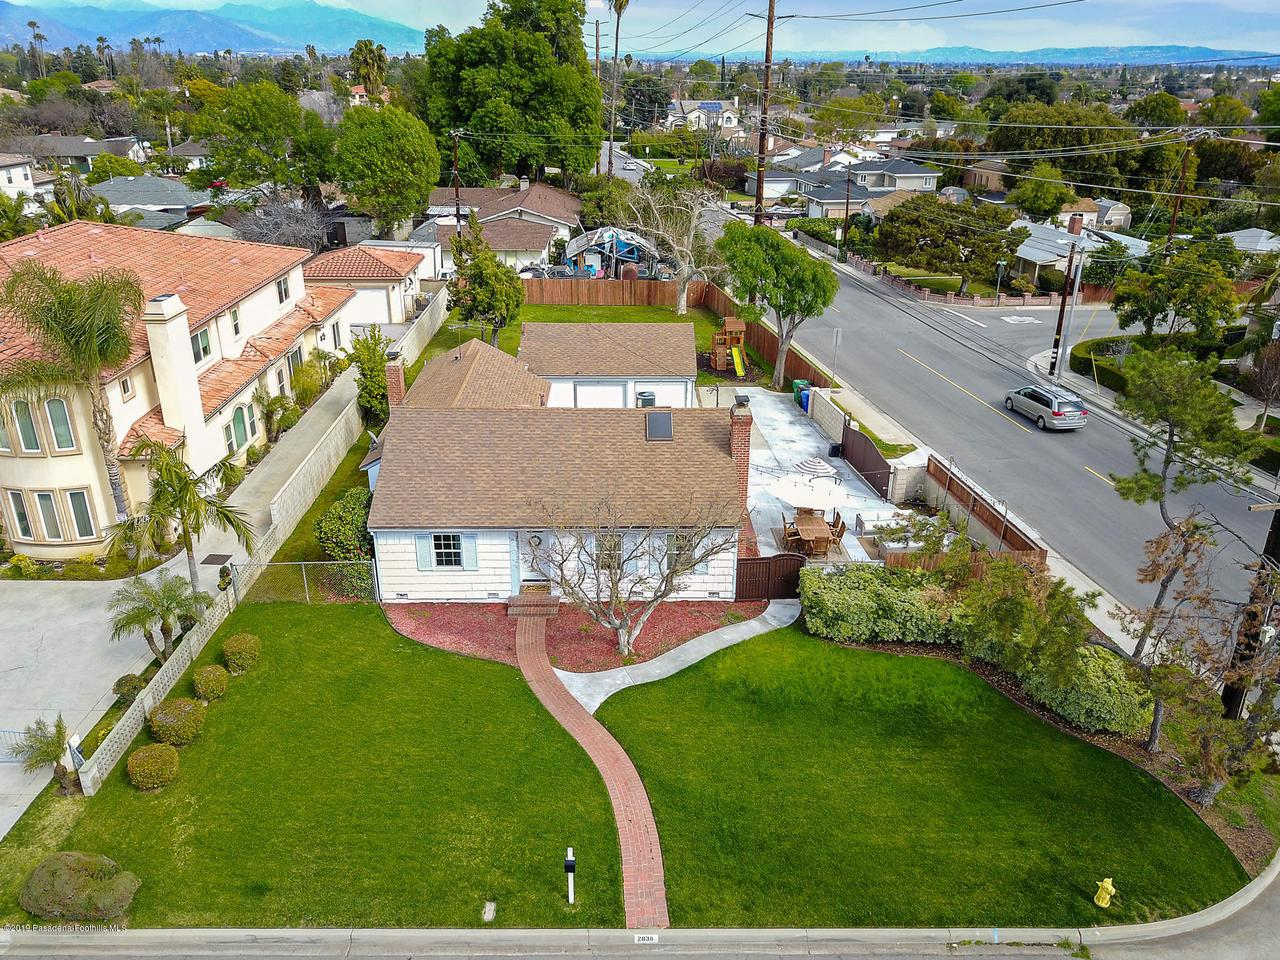 2830 WINTHROP, Arcadia, CA 91007 - 2830 Winthrop Ave (30)